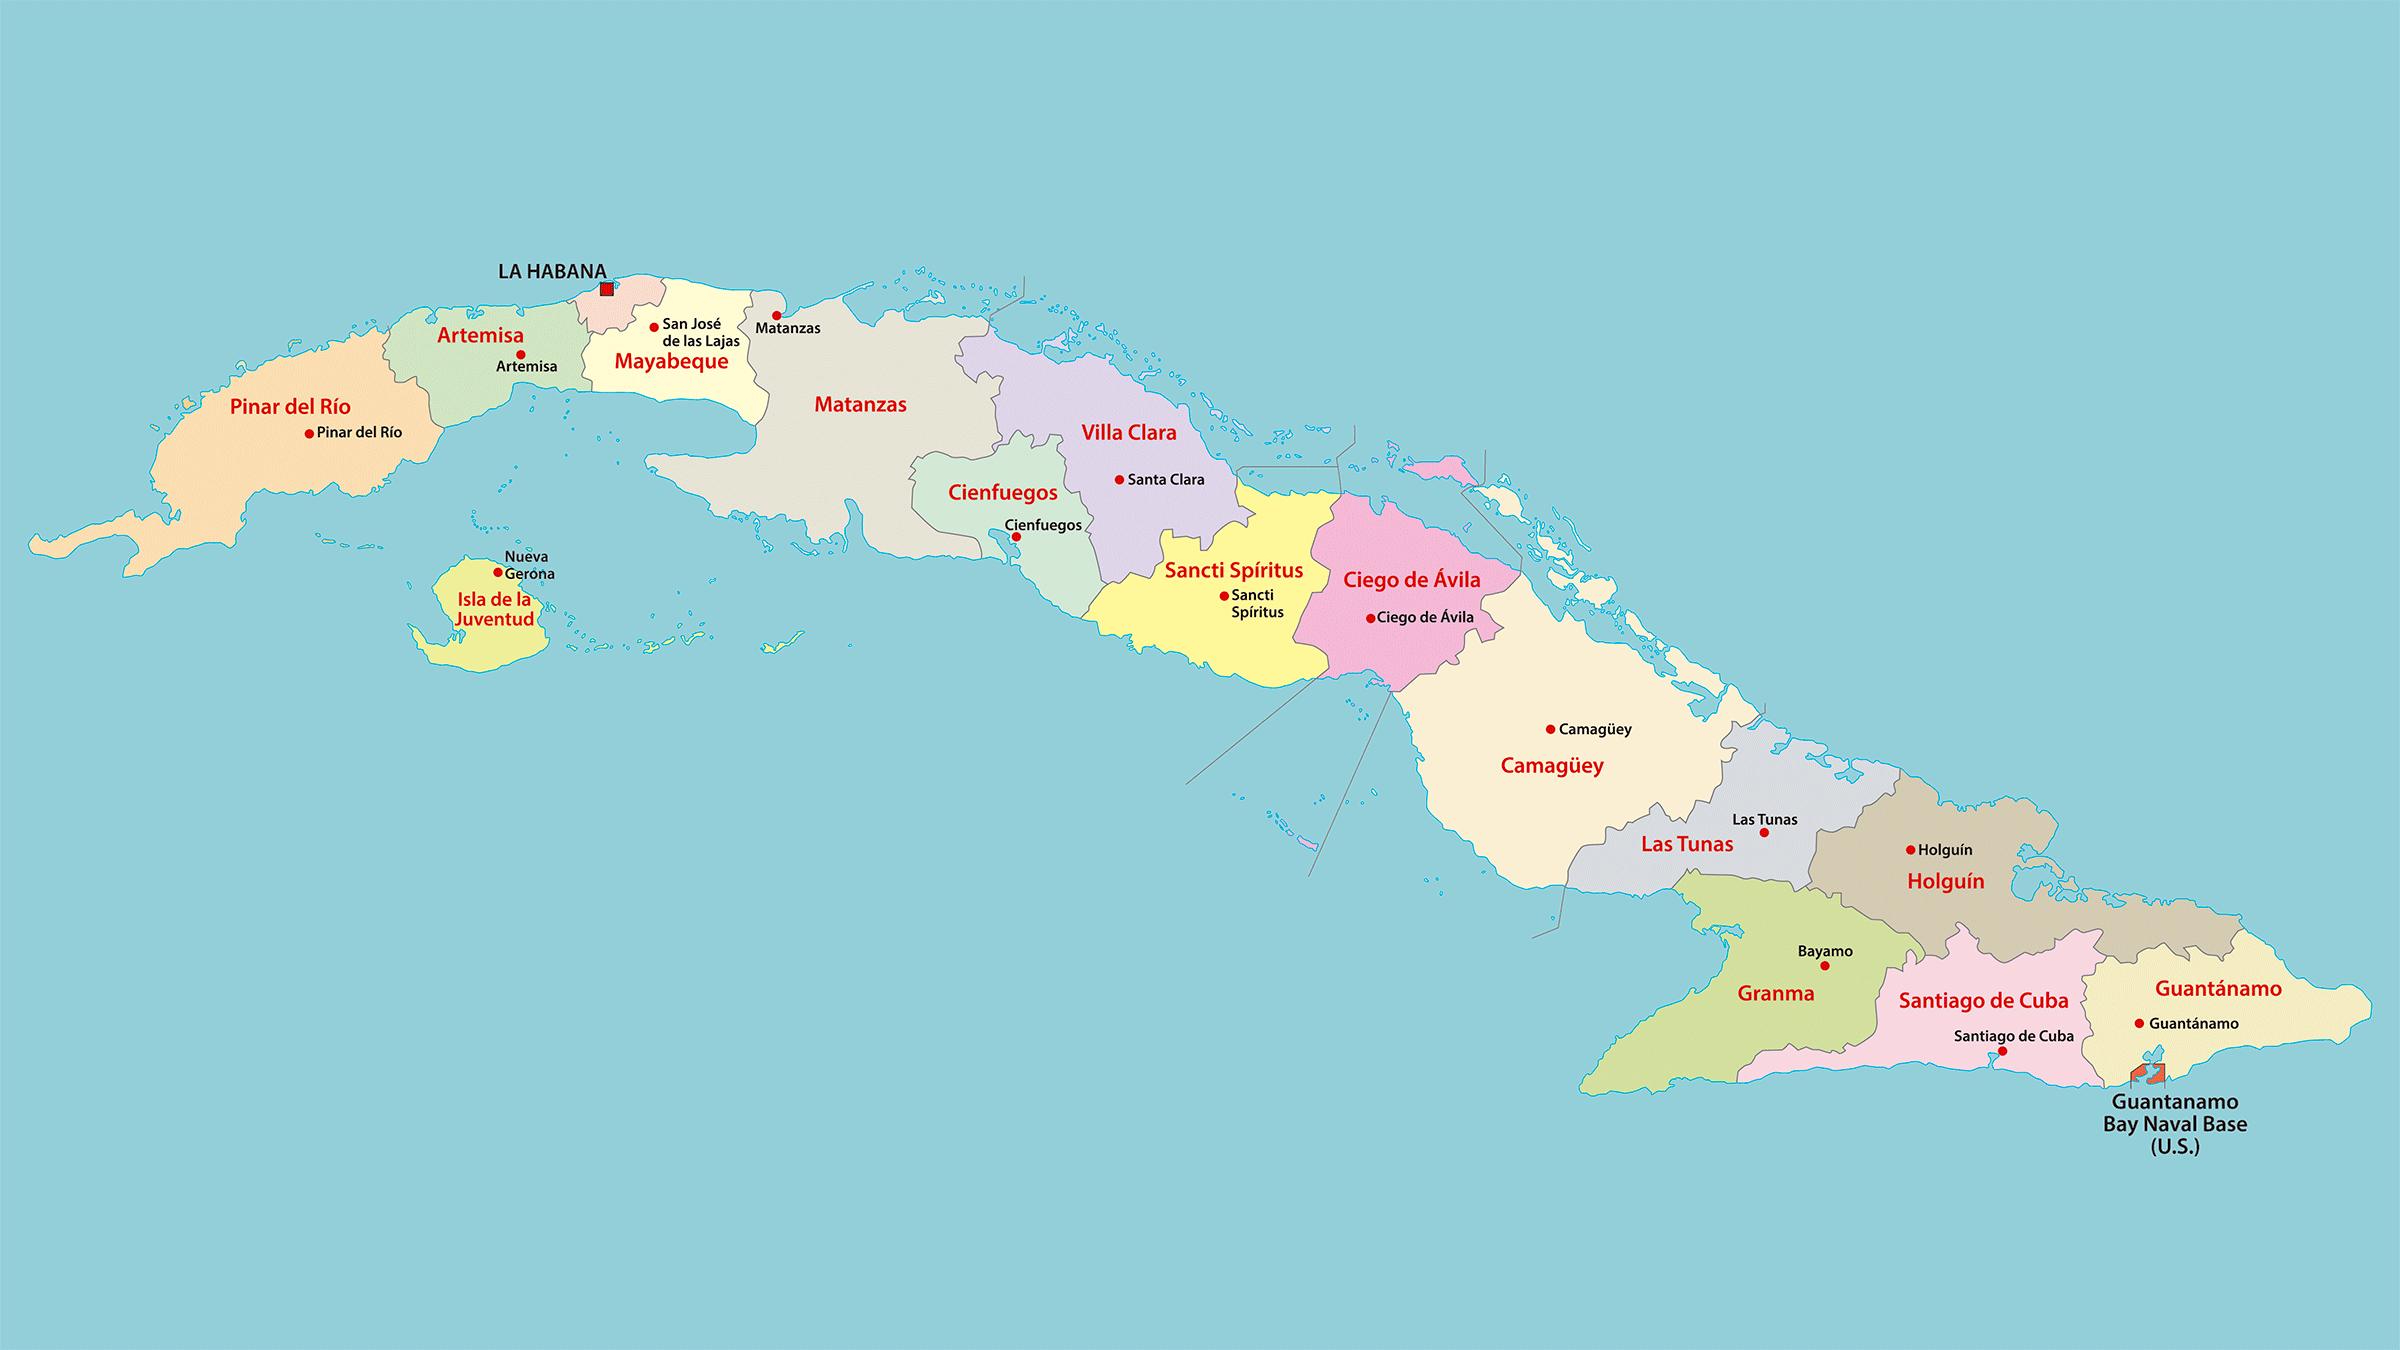 Mapa poltico de cuba gumiabroncs Image collections